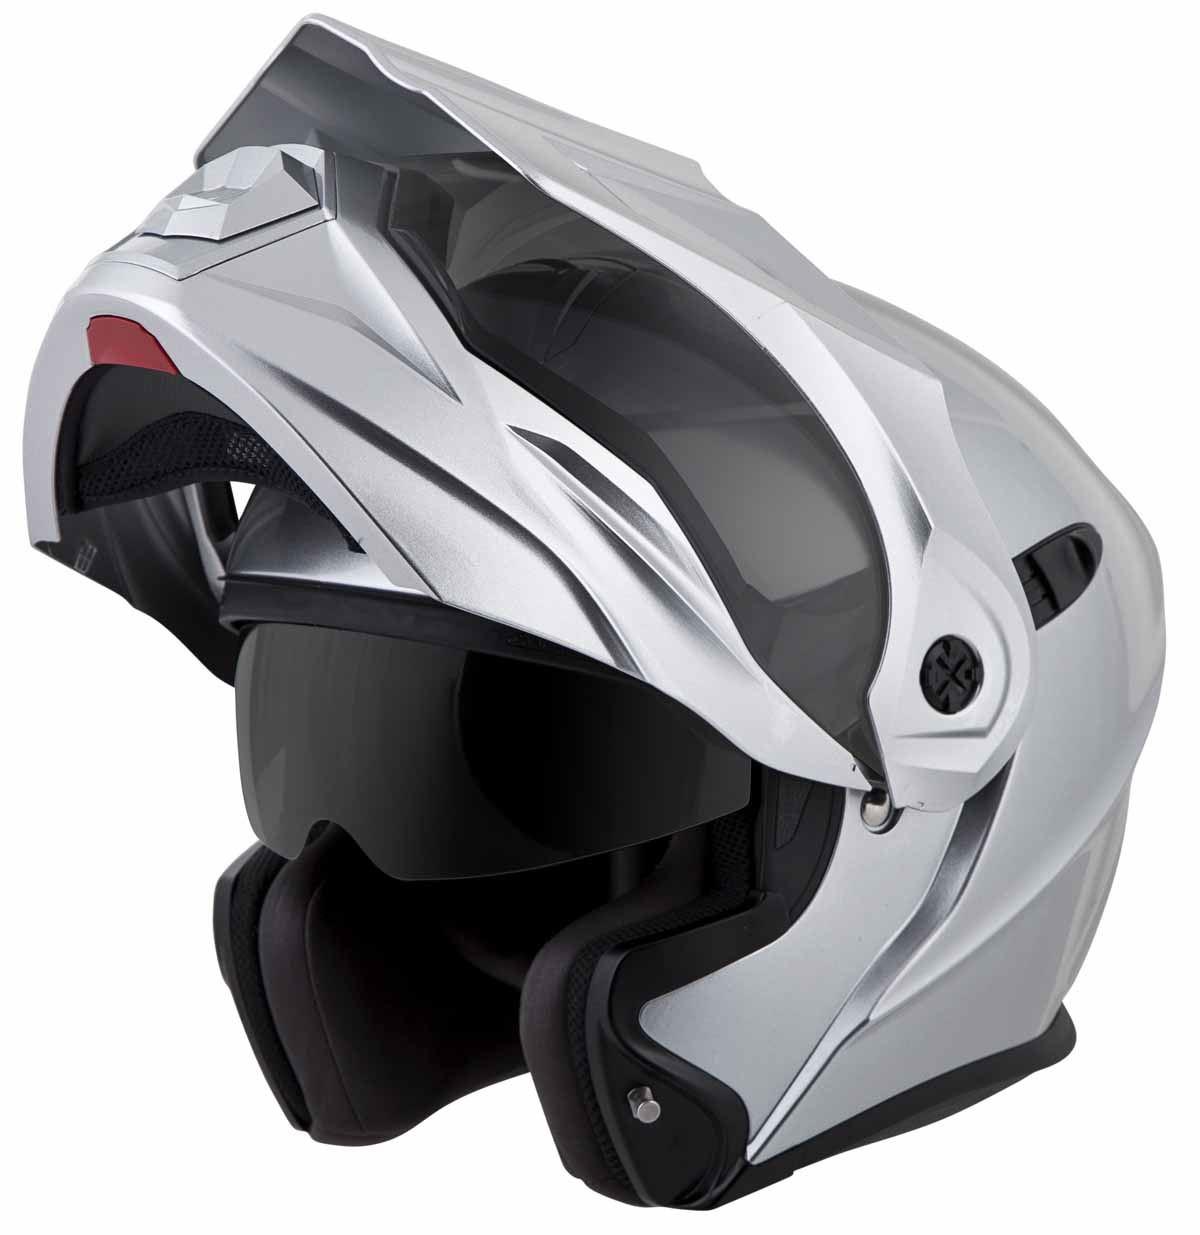 Scorpion-EXO-AT950-Helmet-Flip-Up-Modular-Dual-Sport-Adventure-ADV-DOT-XS-3XL miniature 21